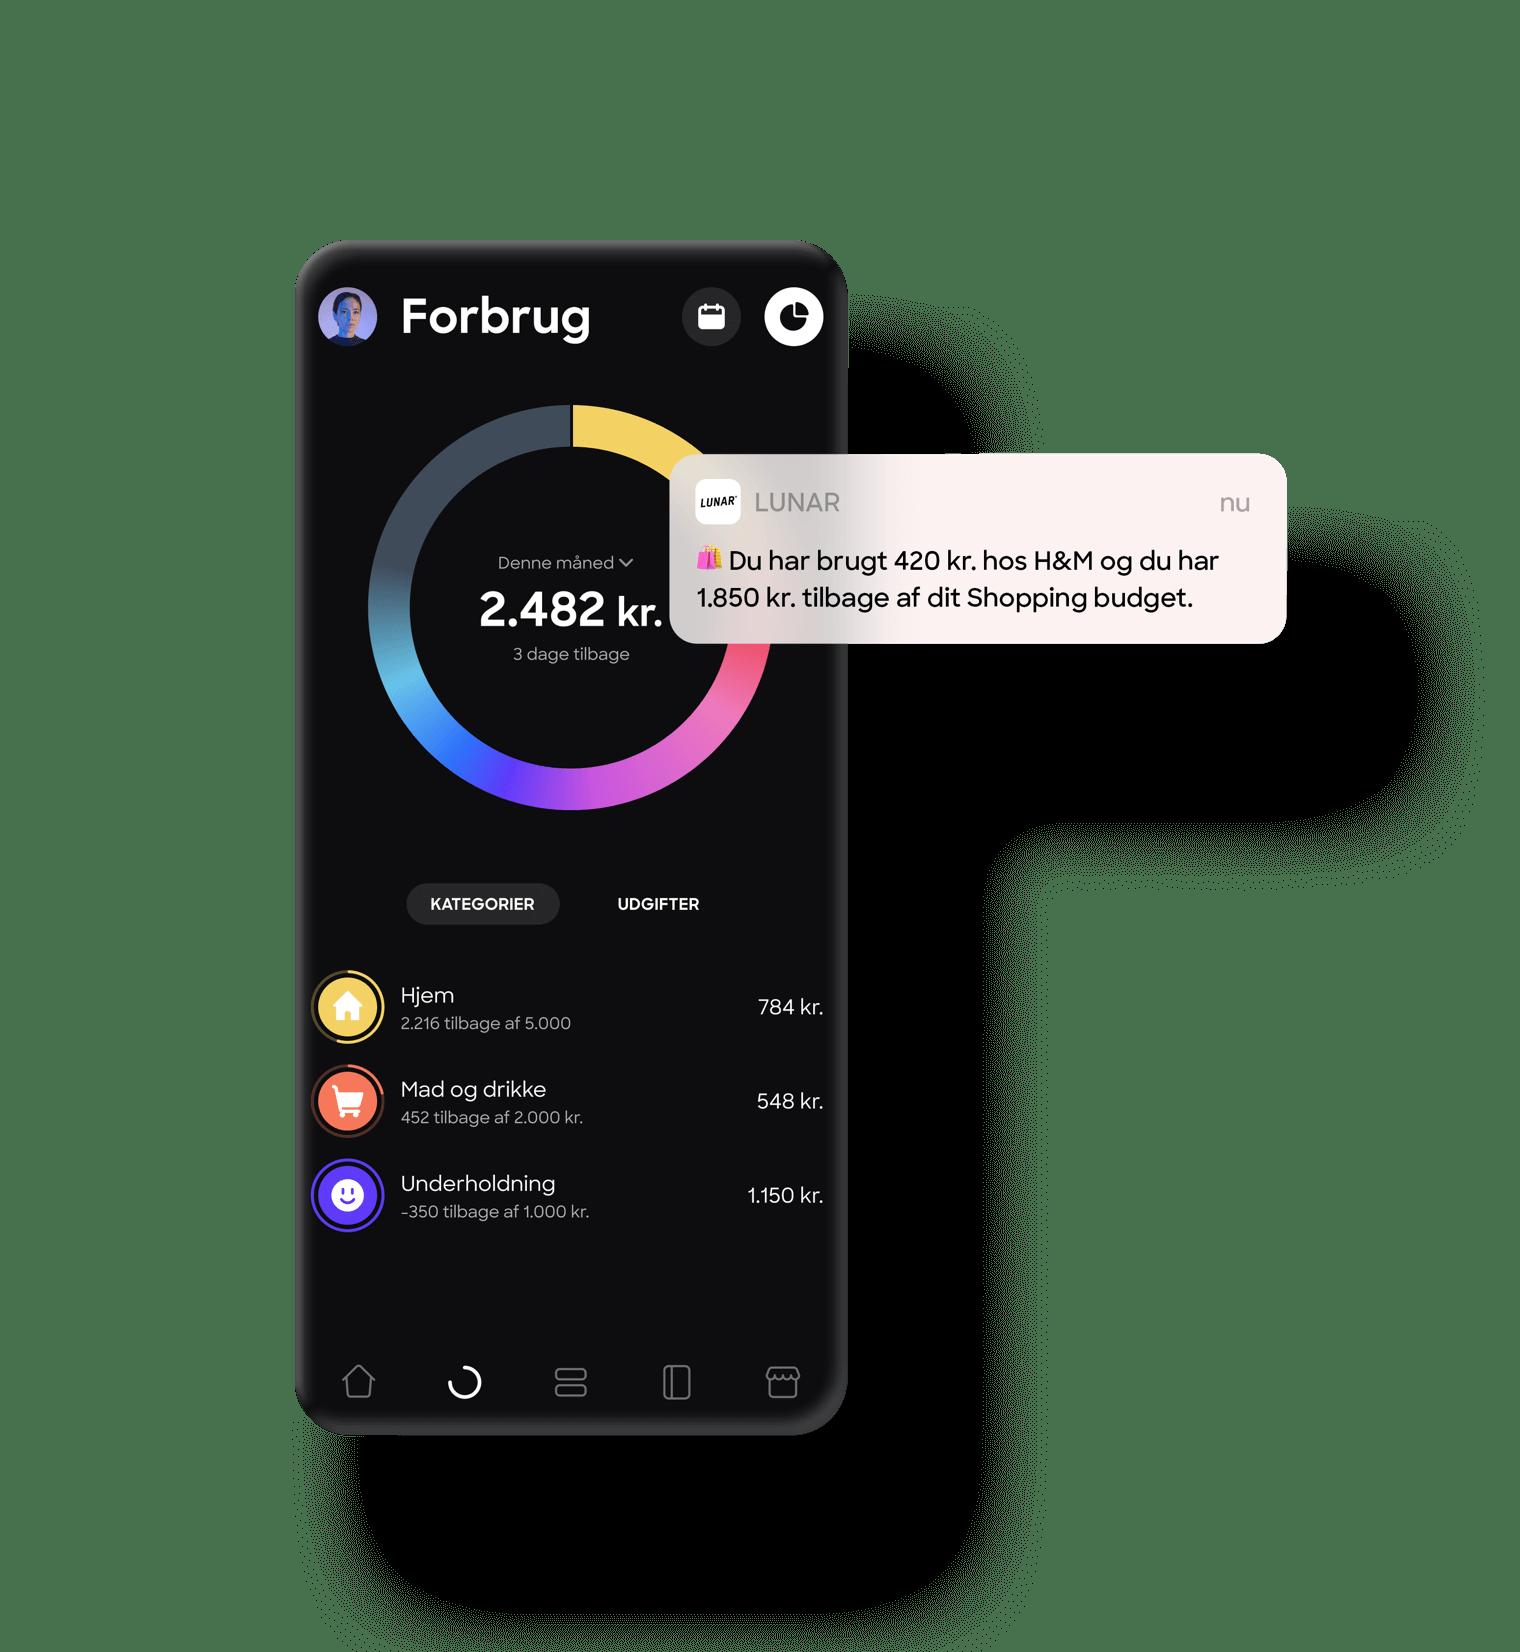 Spend overview in Lunar app